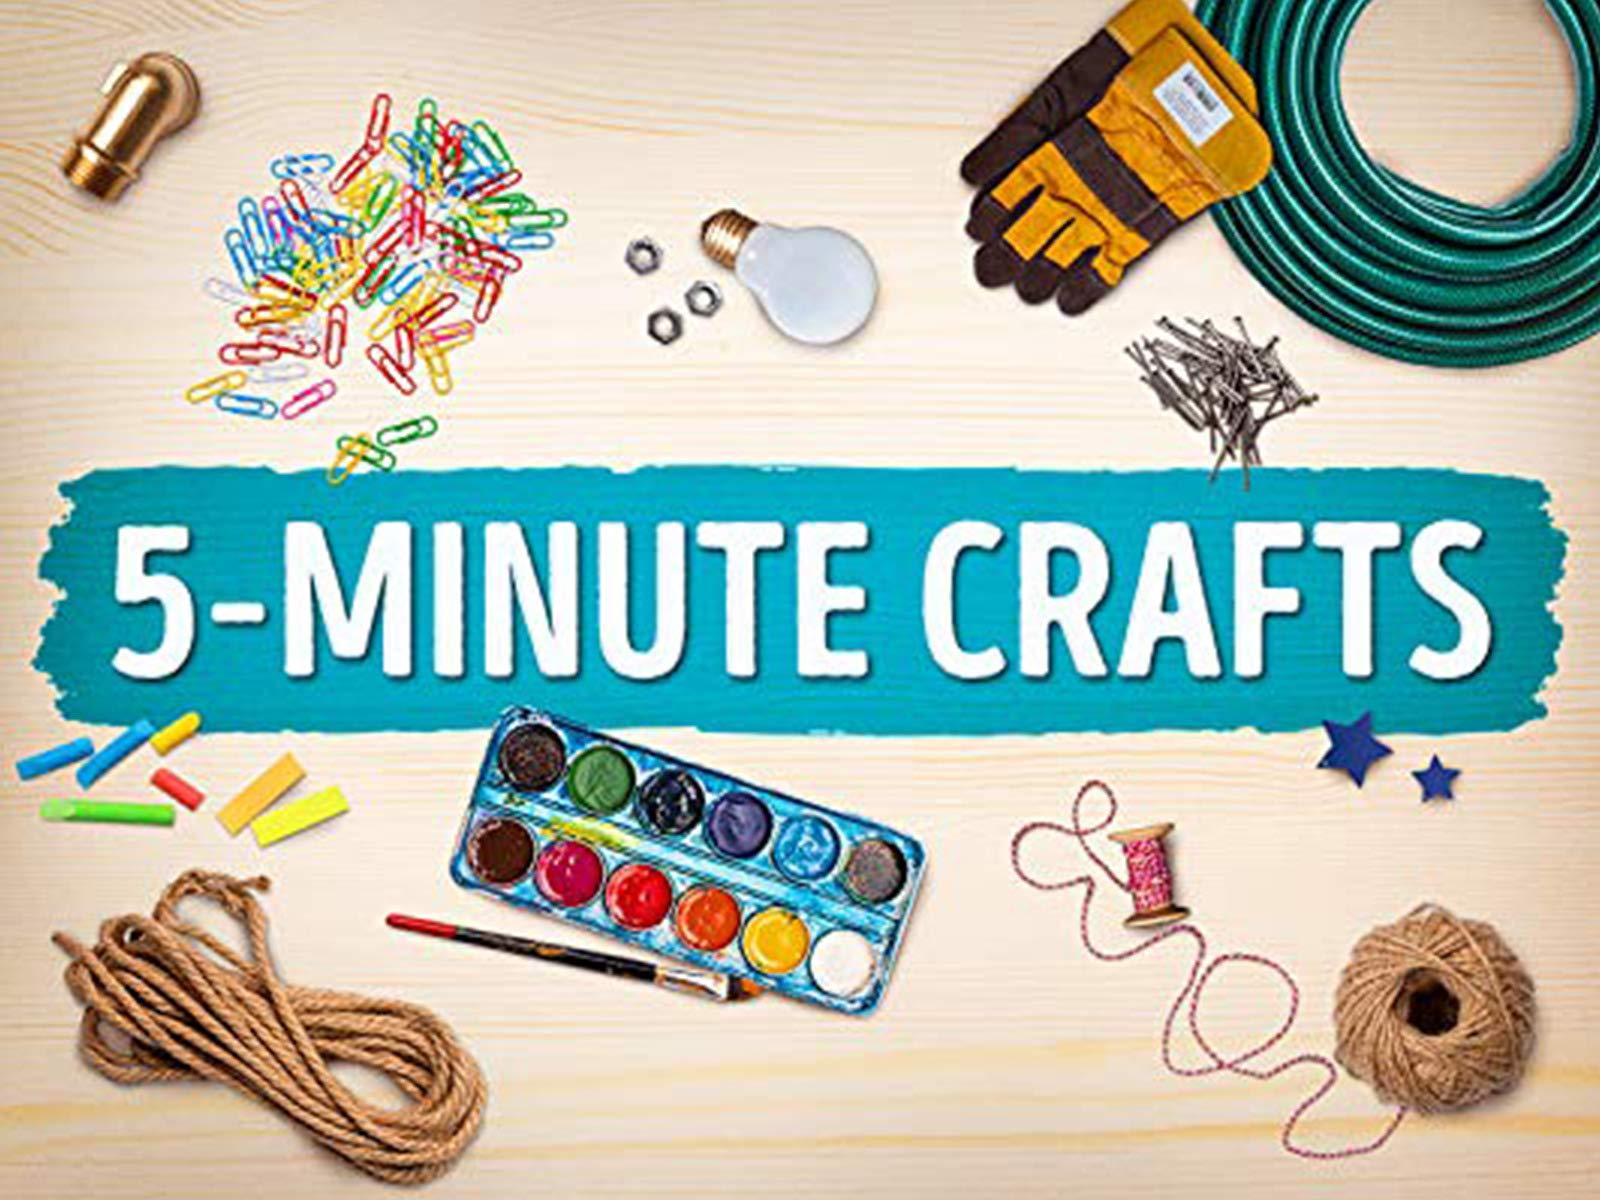 Watch 5 Minute Crafts Prime Video